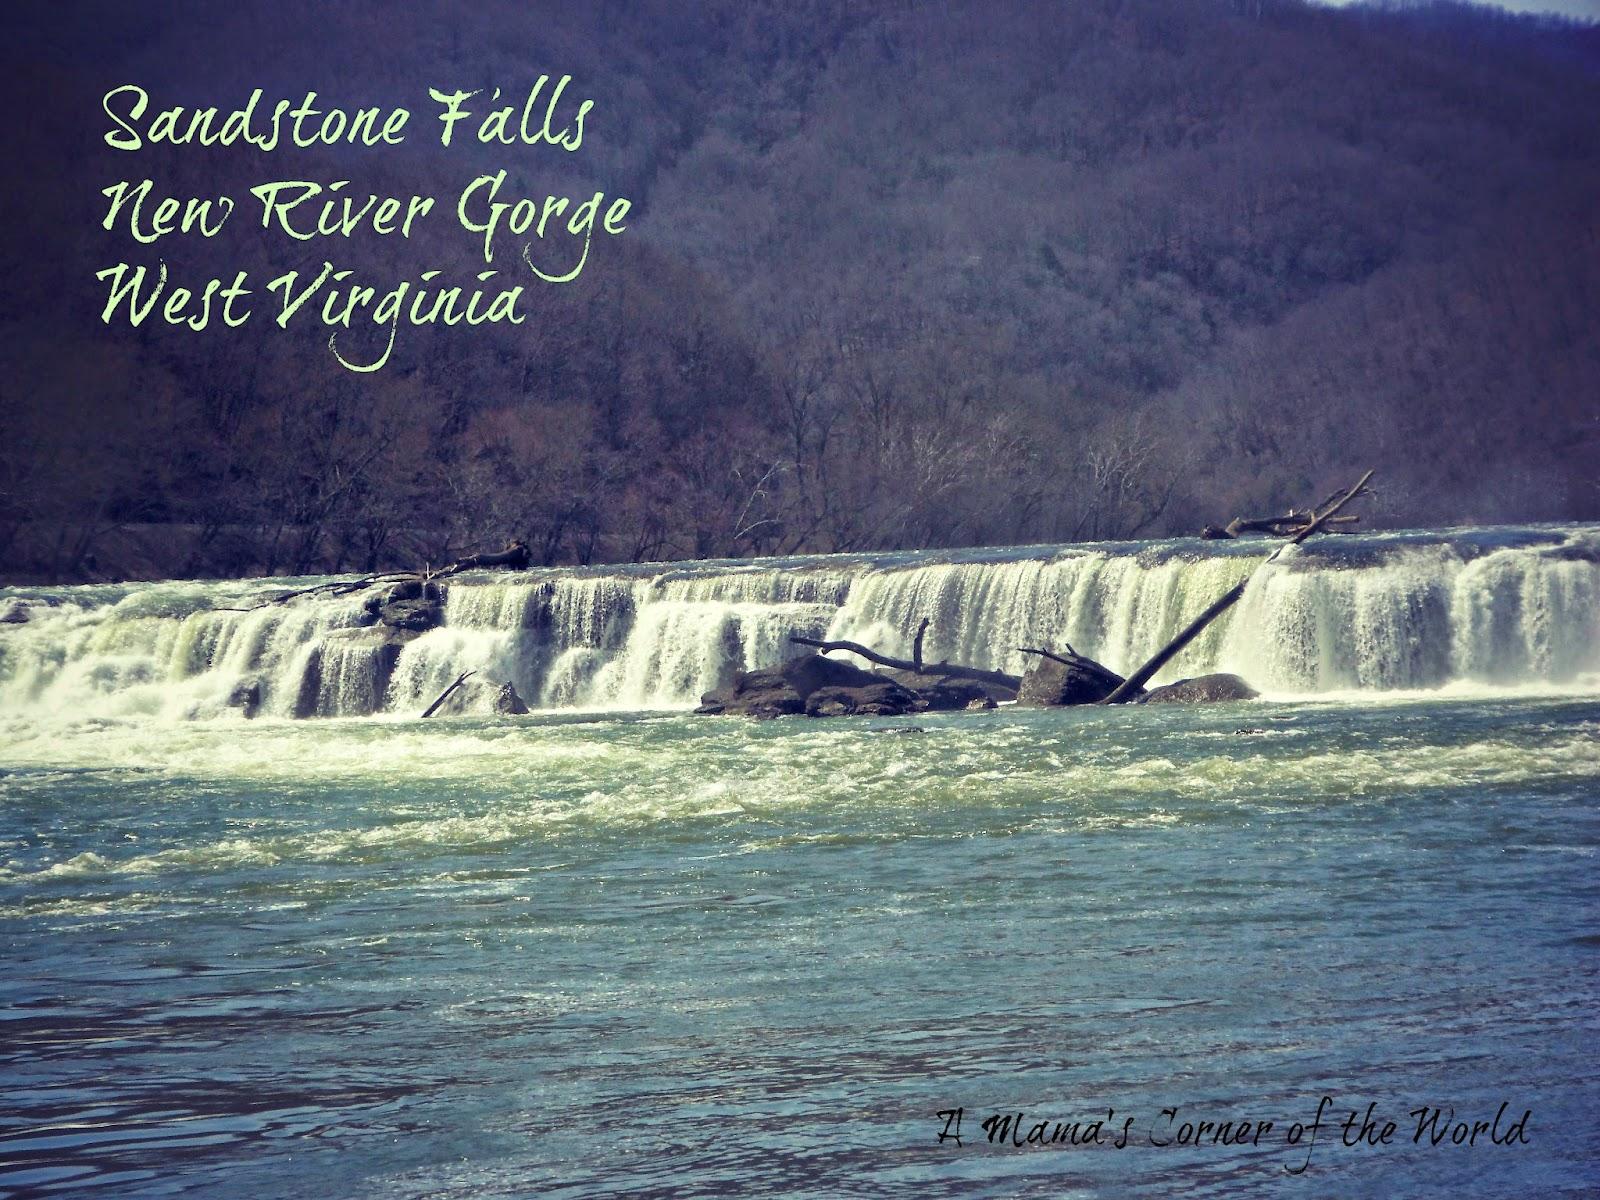 Sandstone Falls New River Gorge